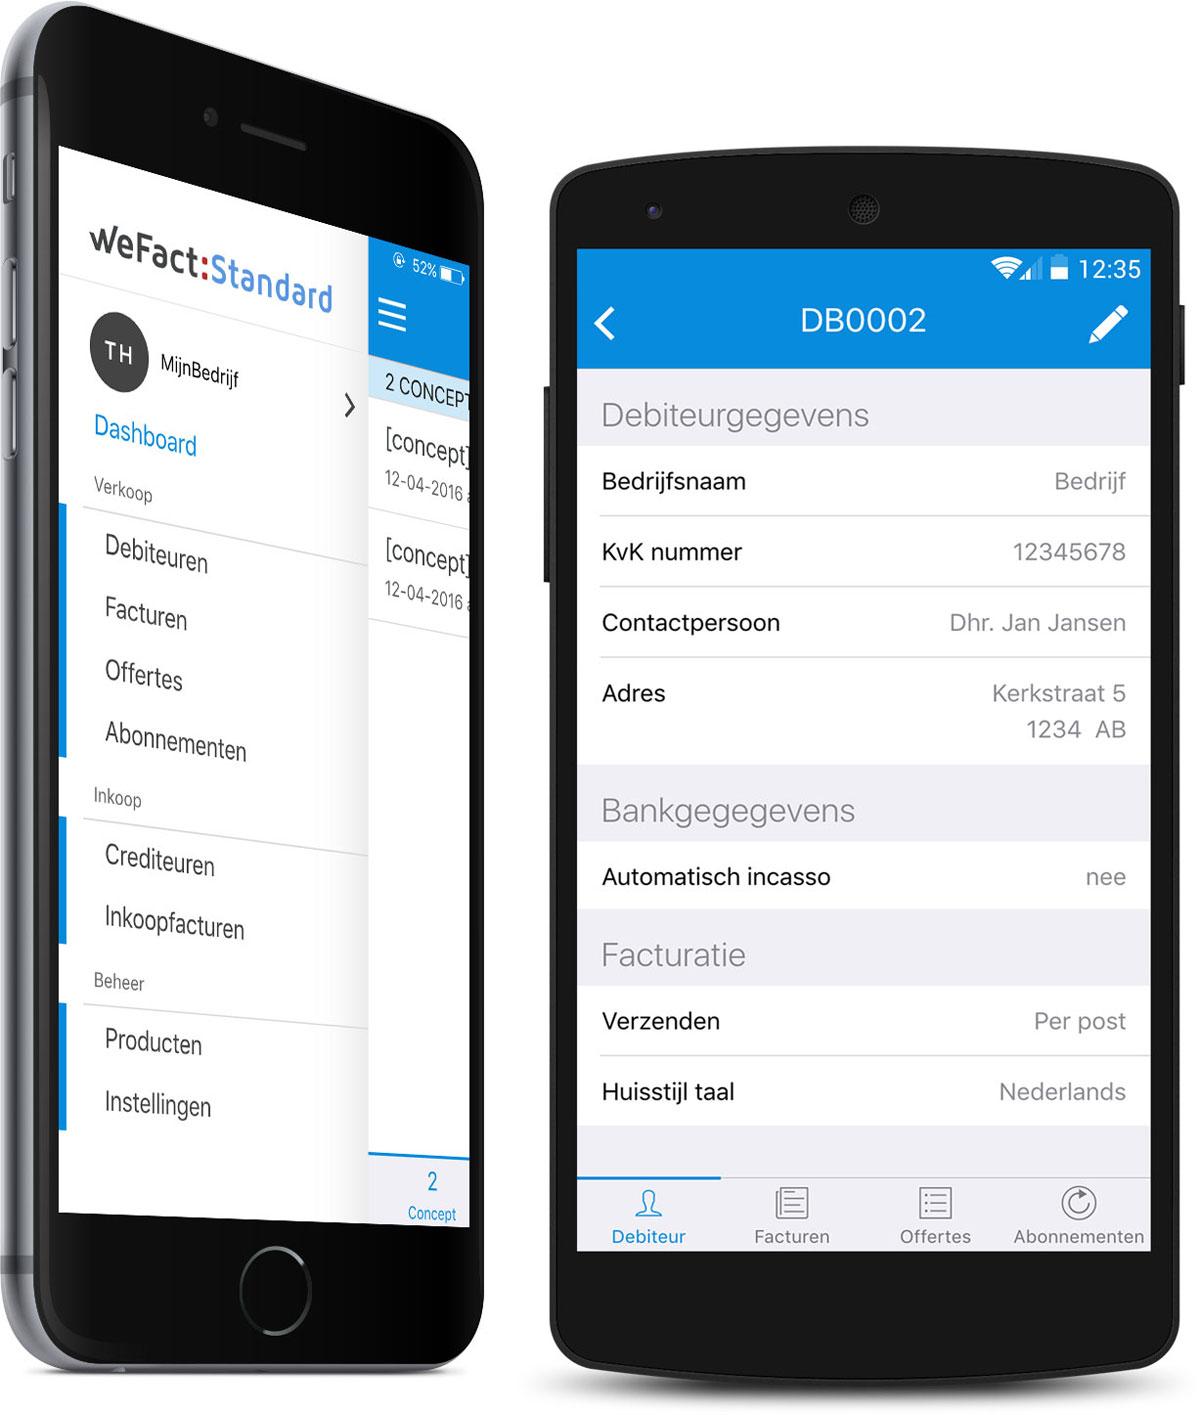 WeFact Standard mobiele app